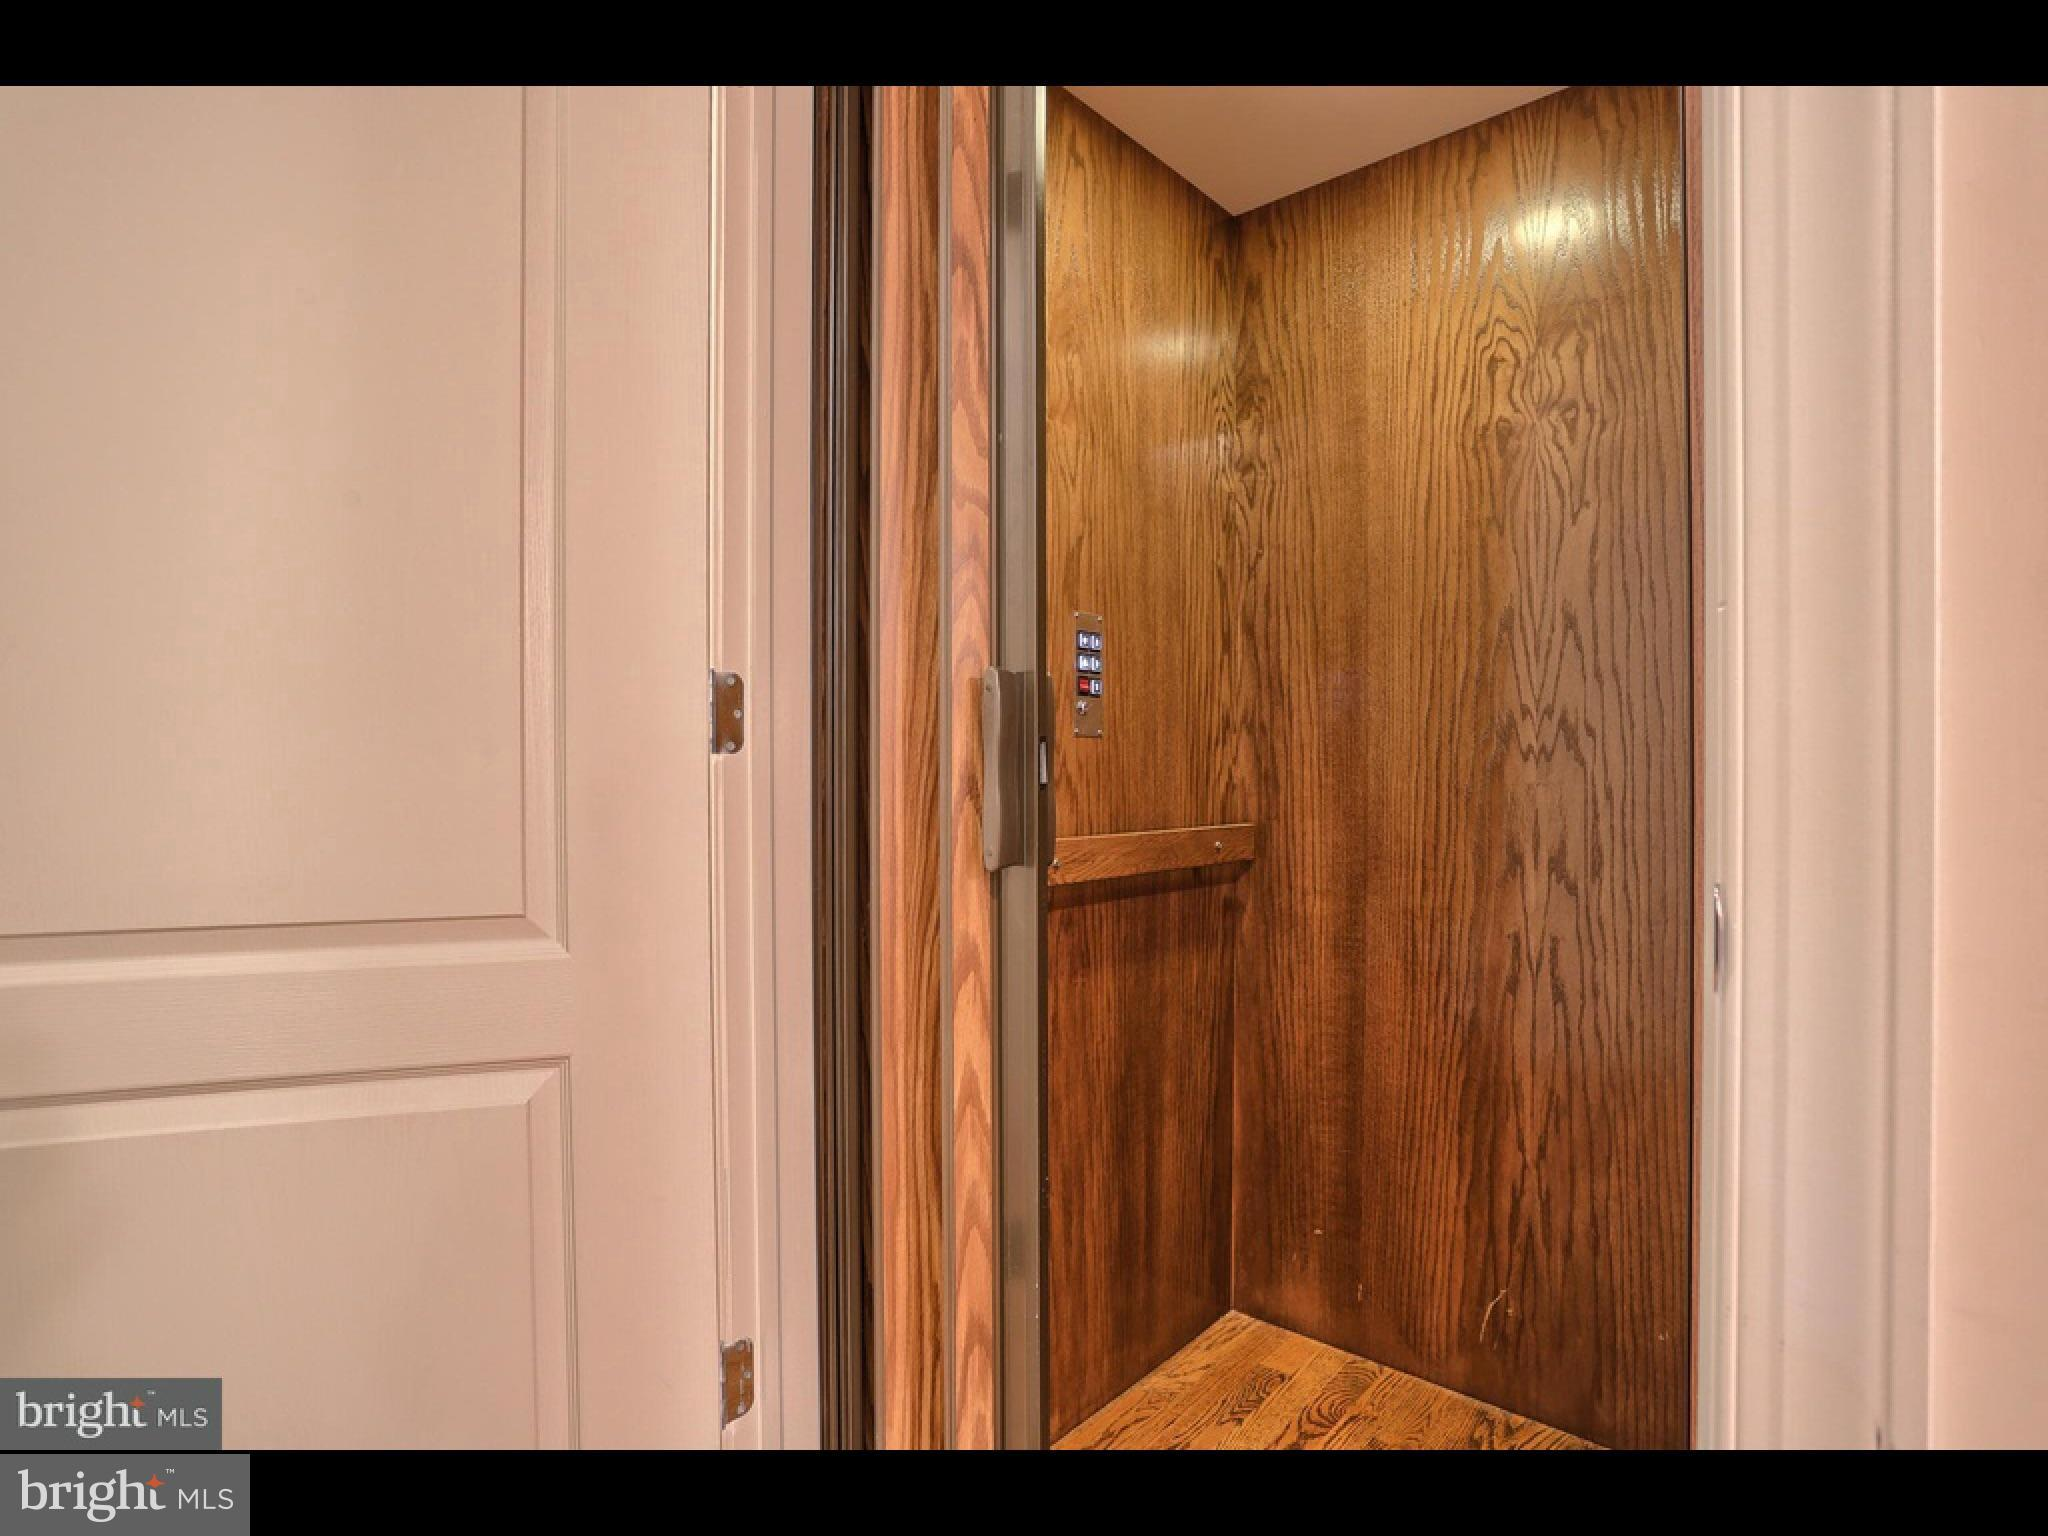 Interior of 3 floor elevator